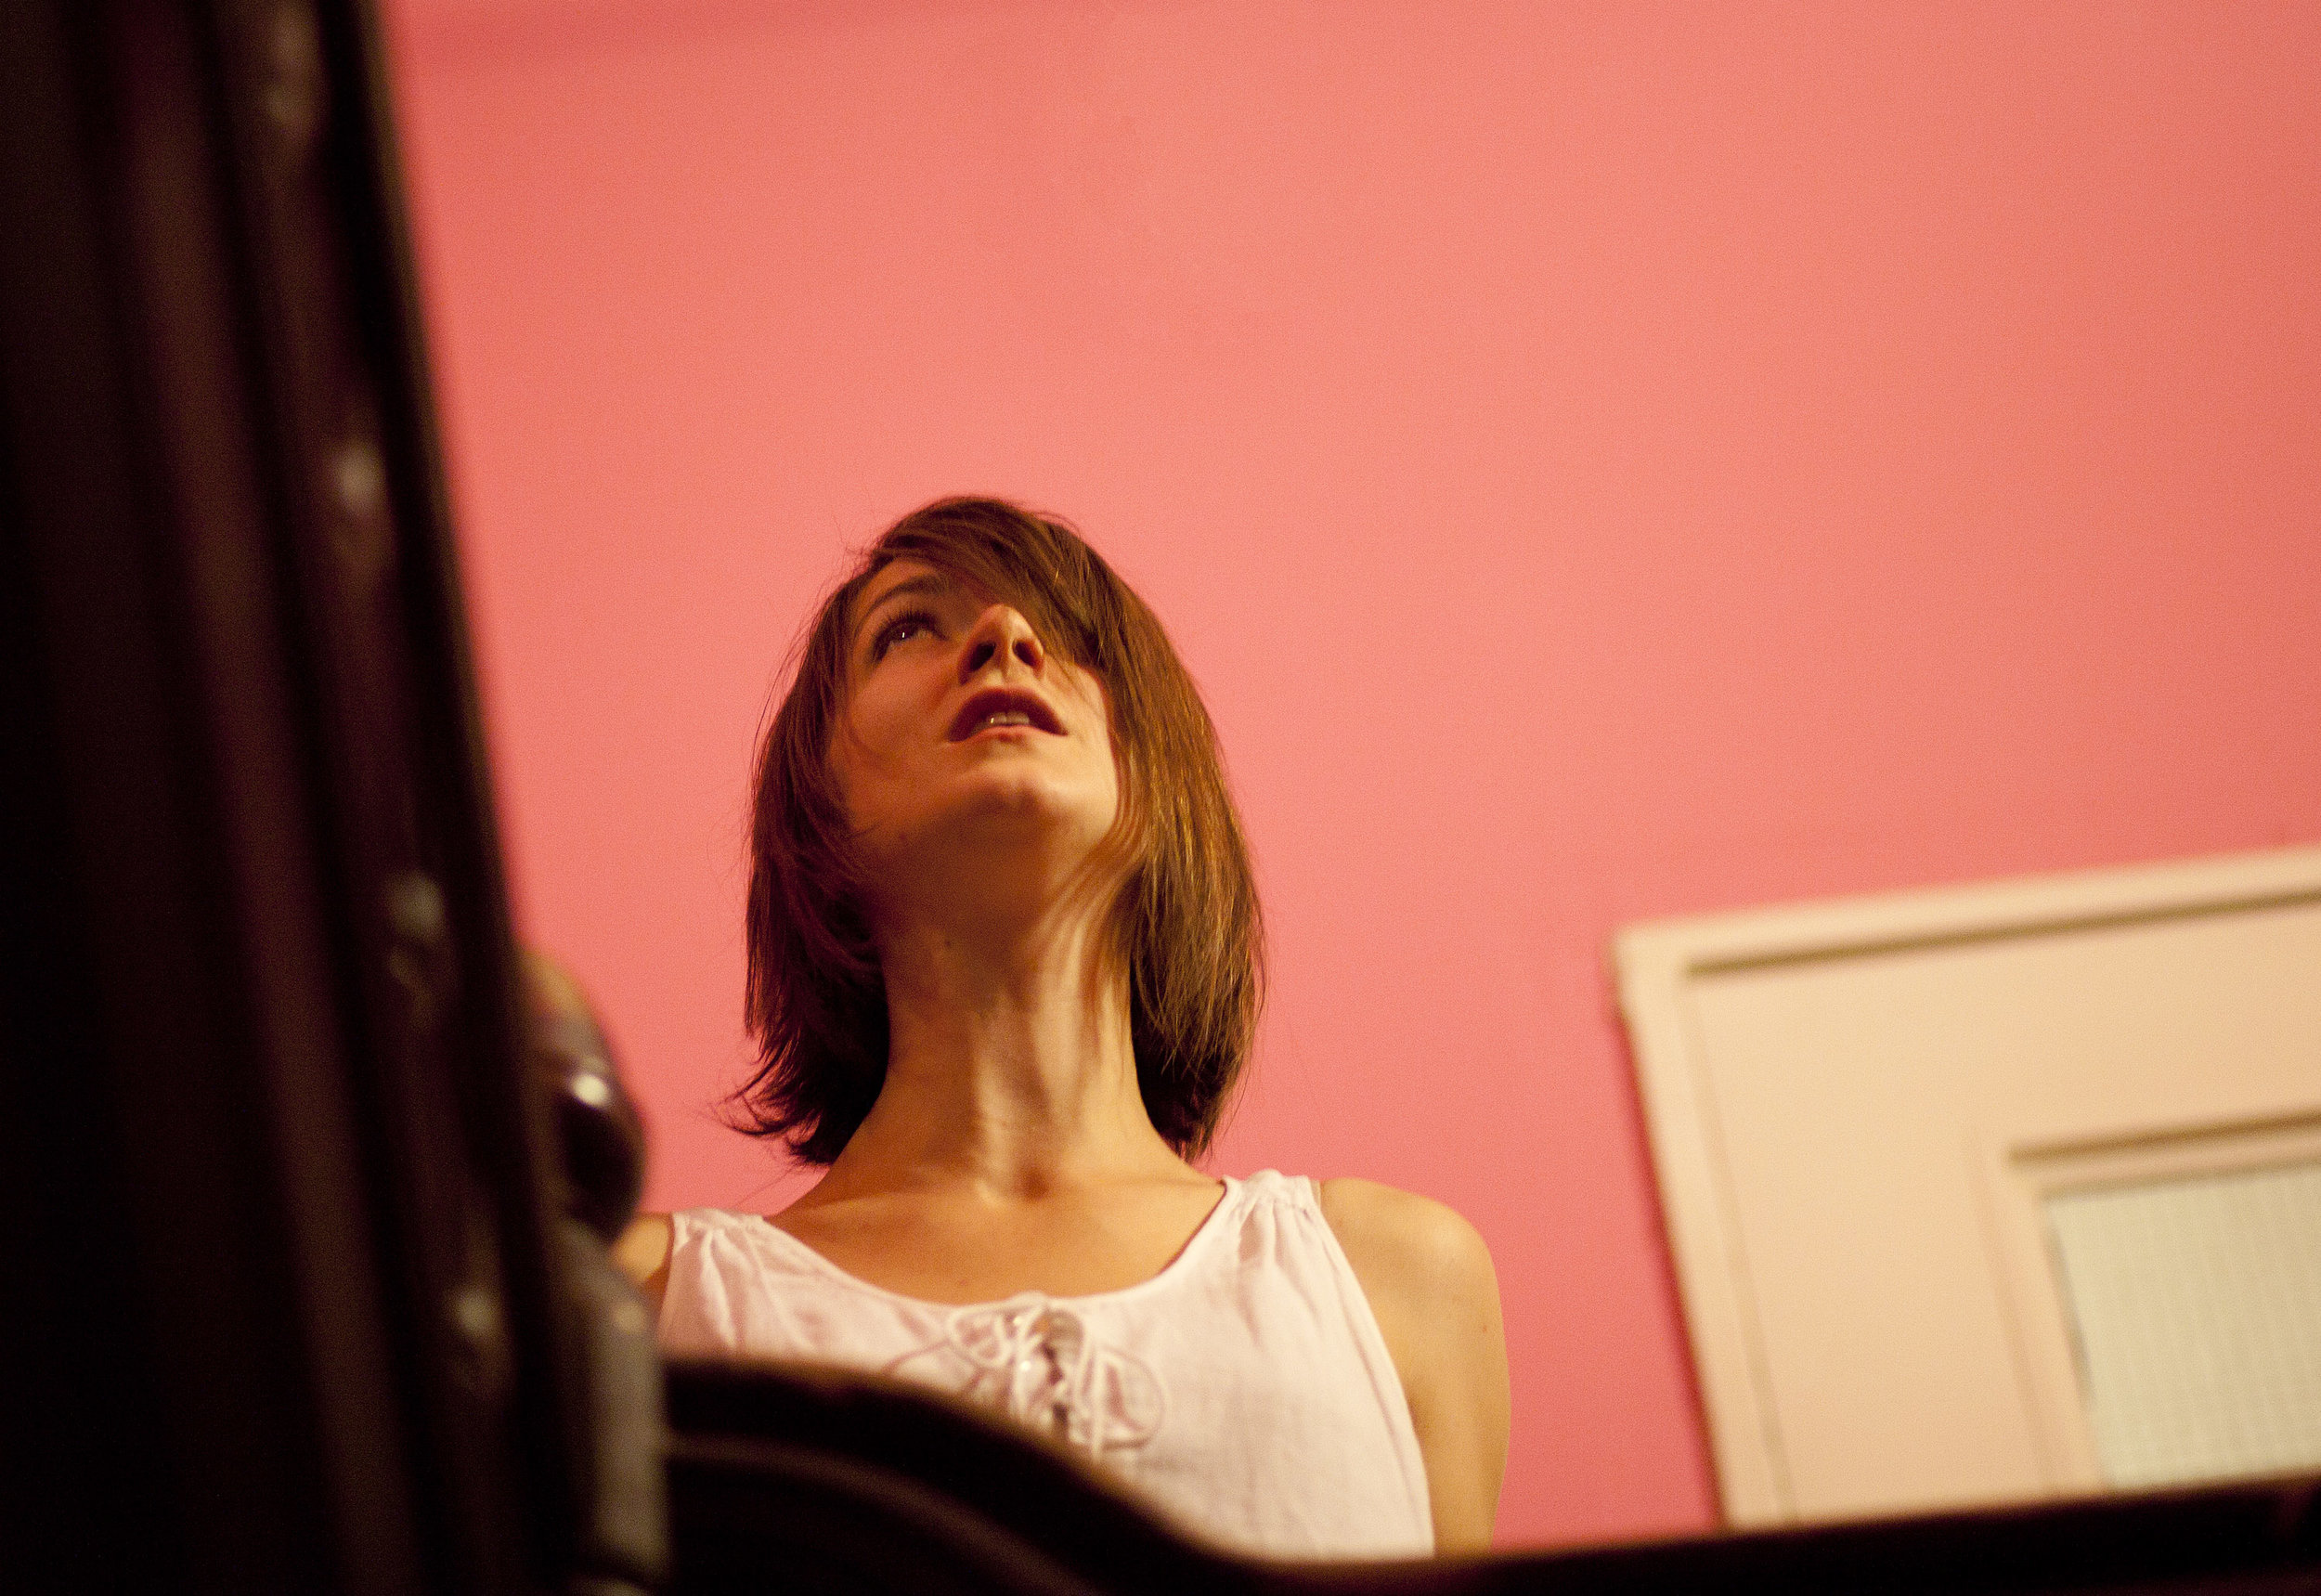 Emily Atkinson ,Photography by John Lauener